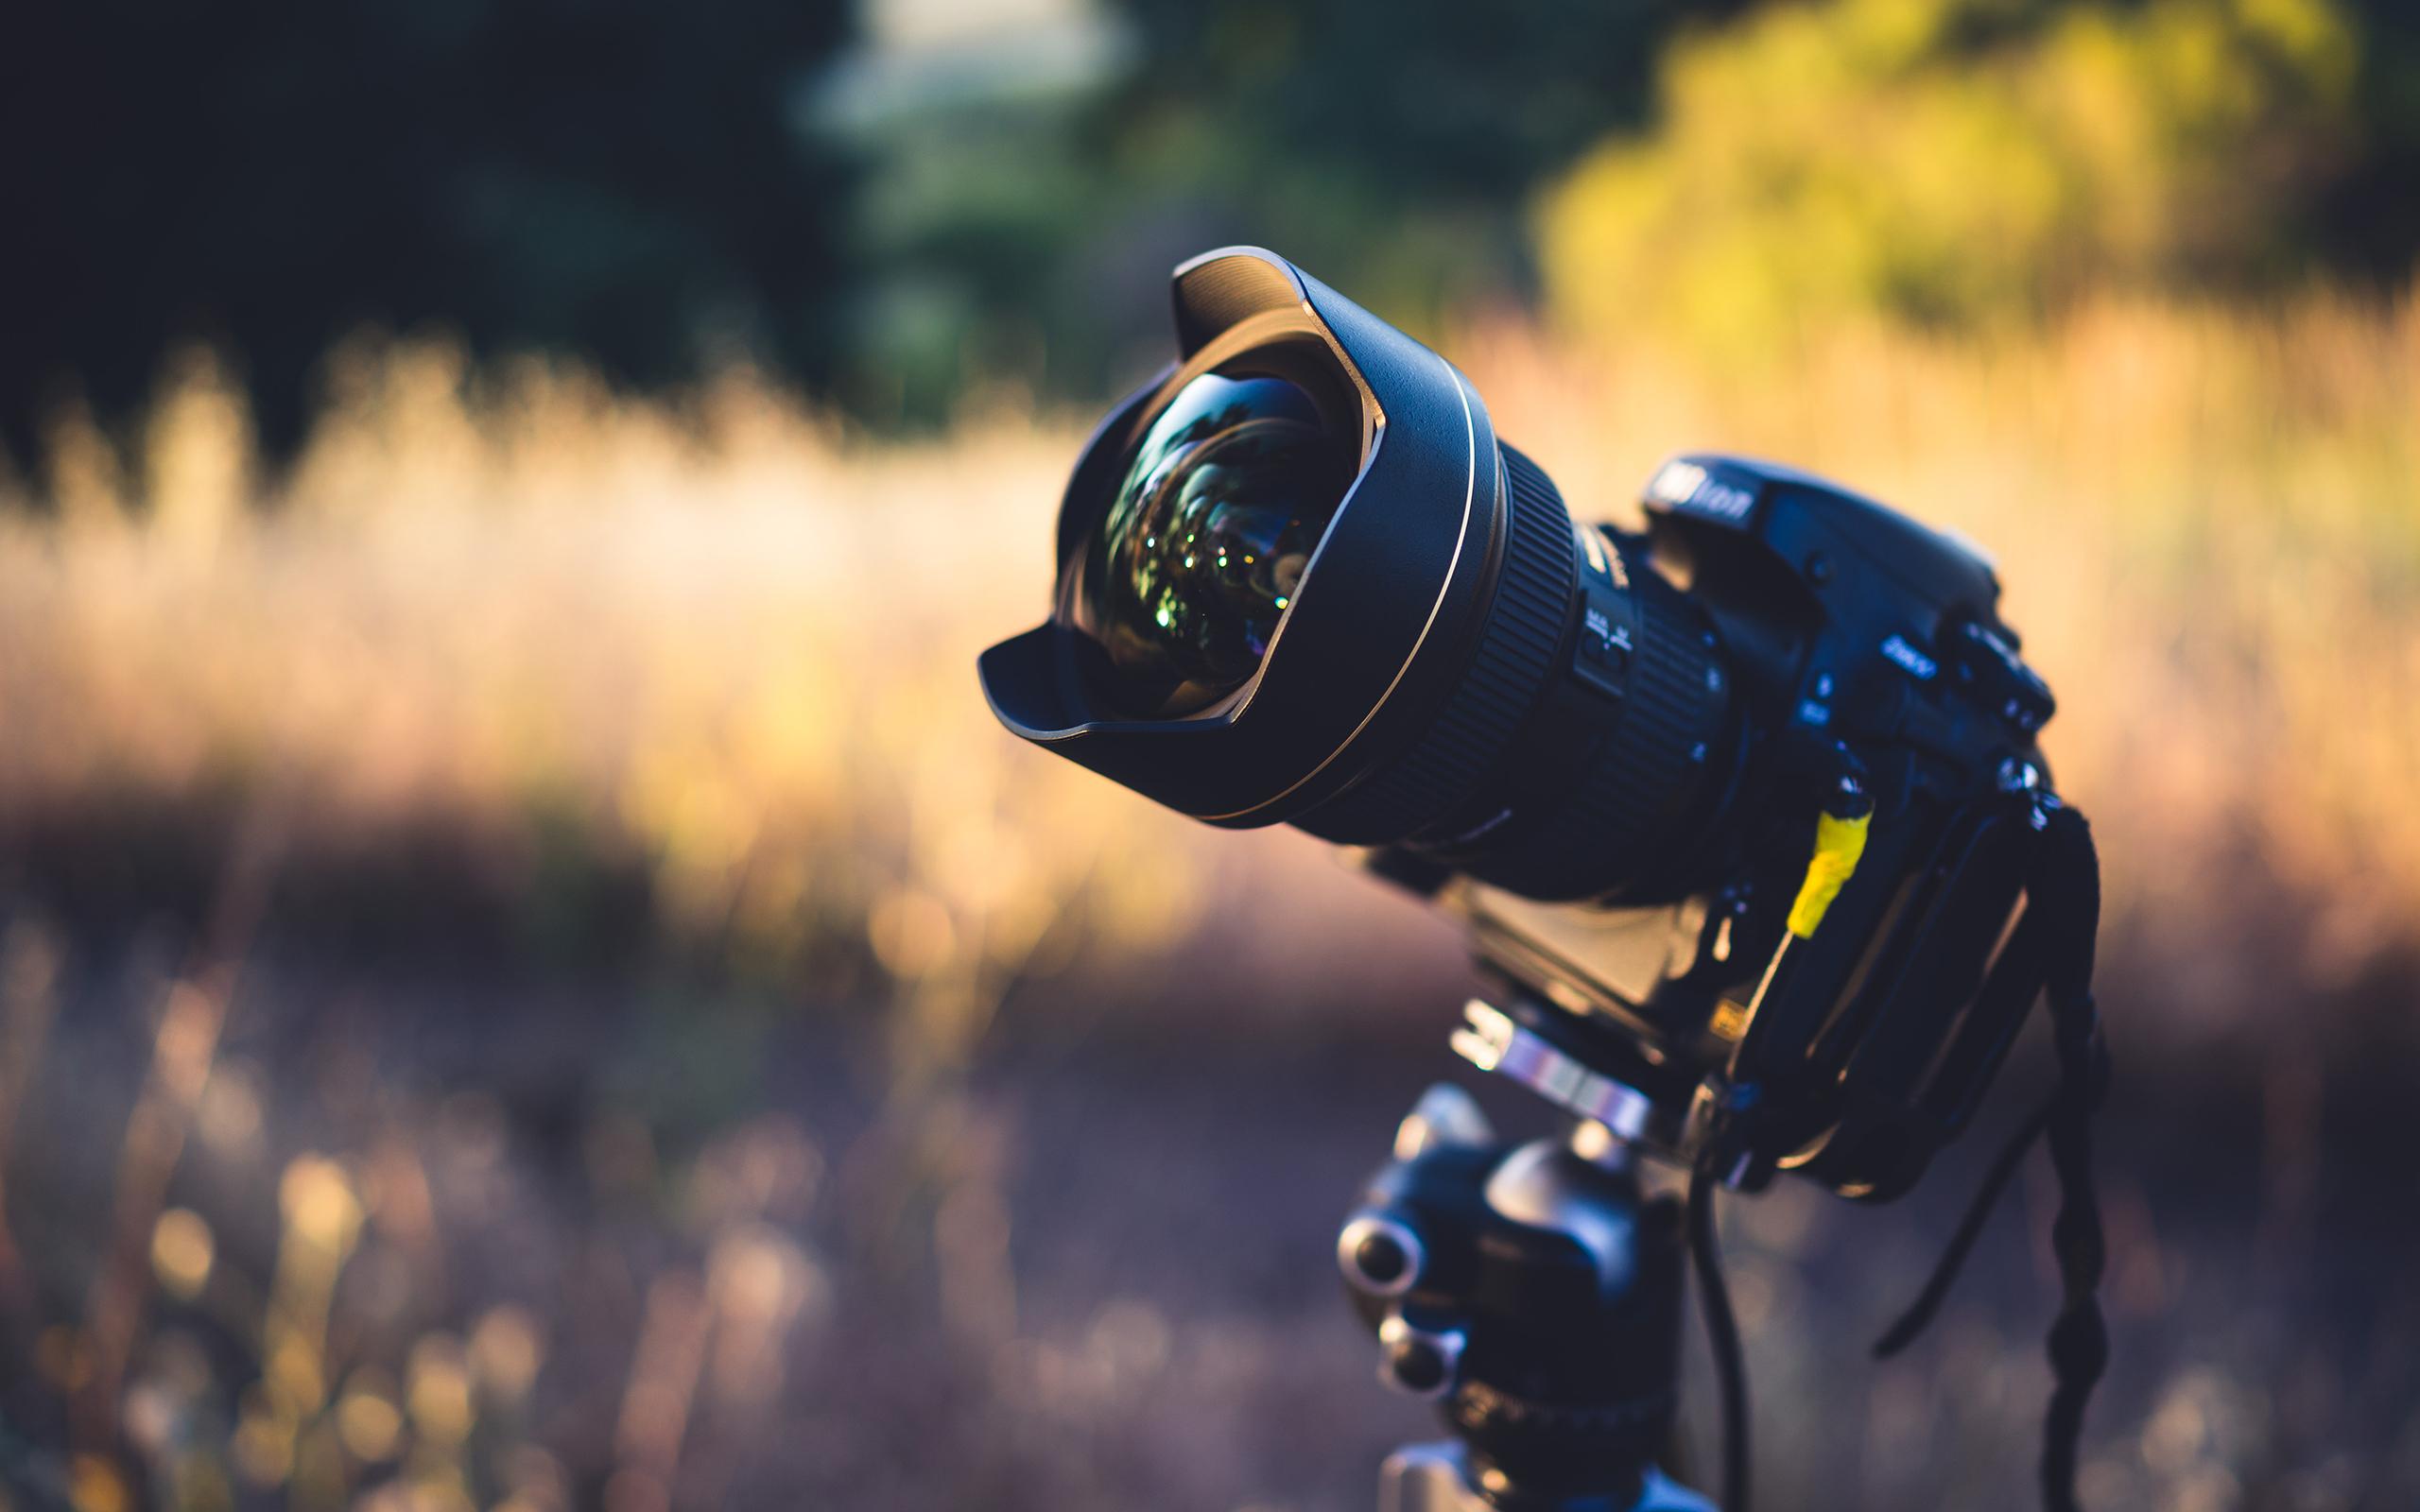 Camera Lens Nikon DSLR photography wallpaper | 2560x1600 ...